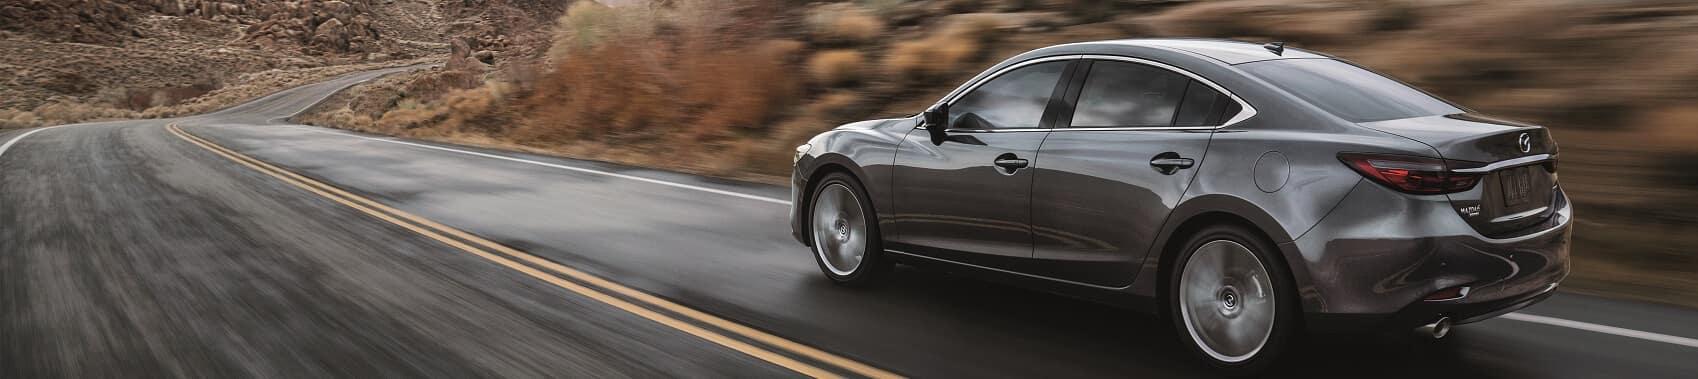 Our Mazda Dealership